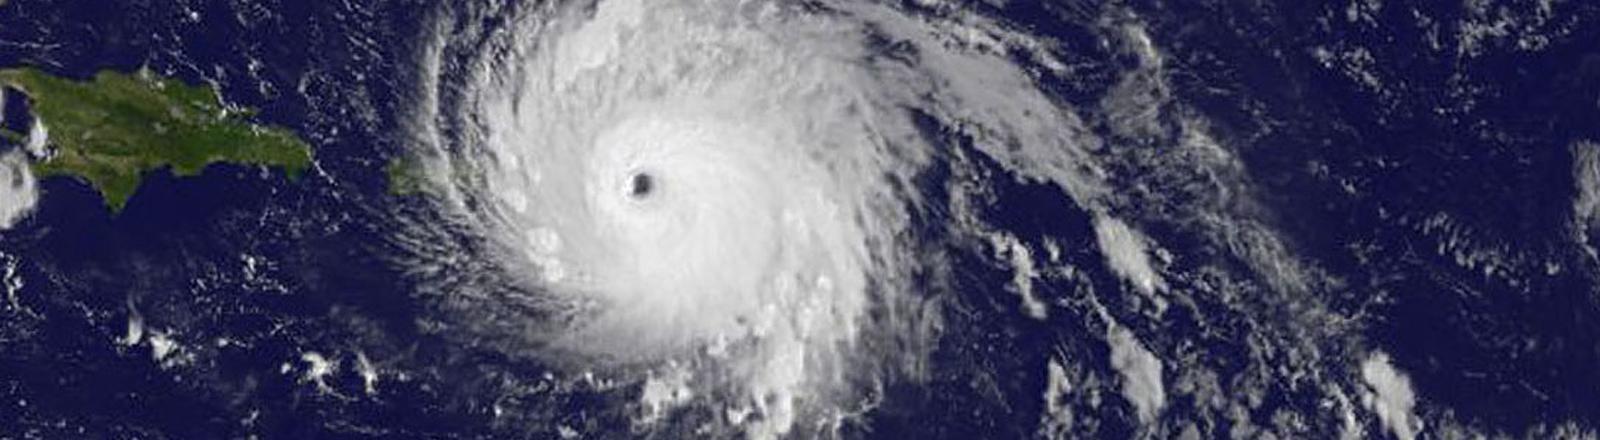 Satellitenaufnahme eines Sturms